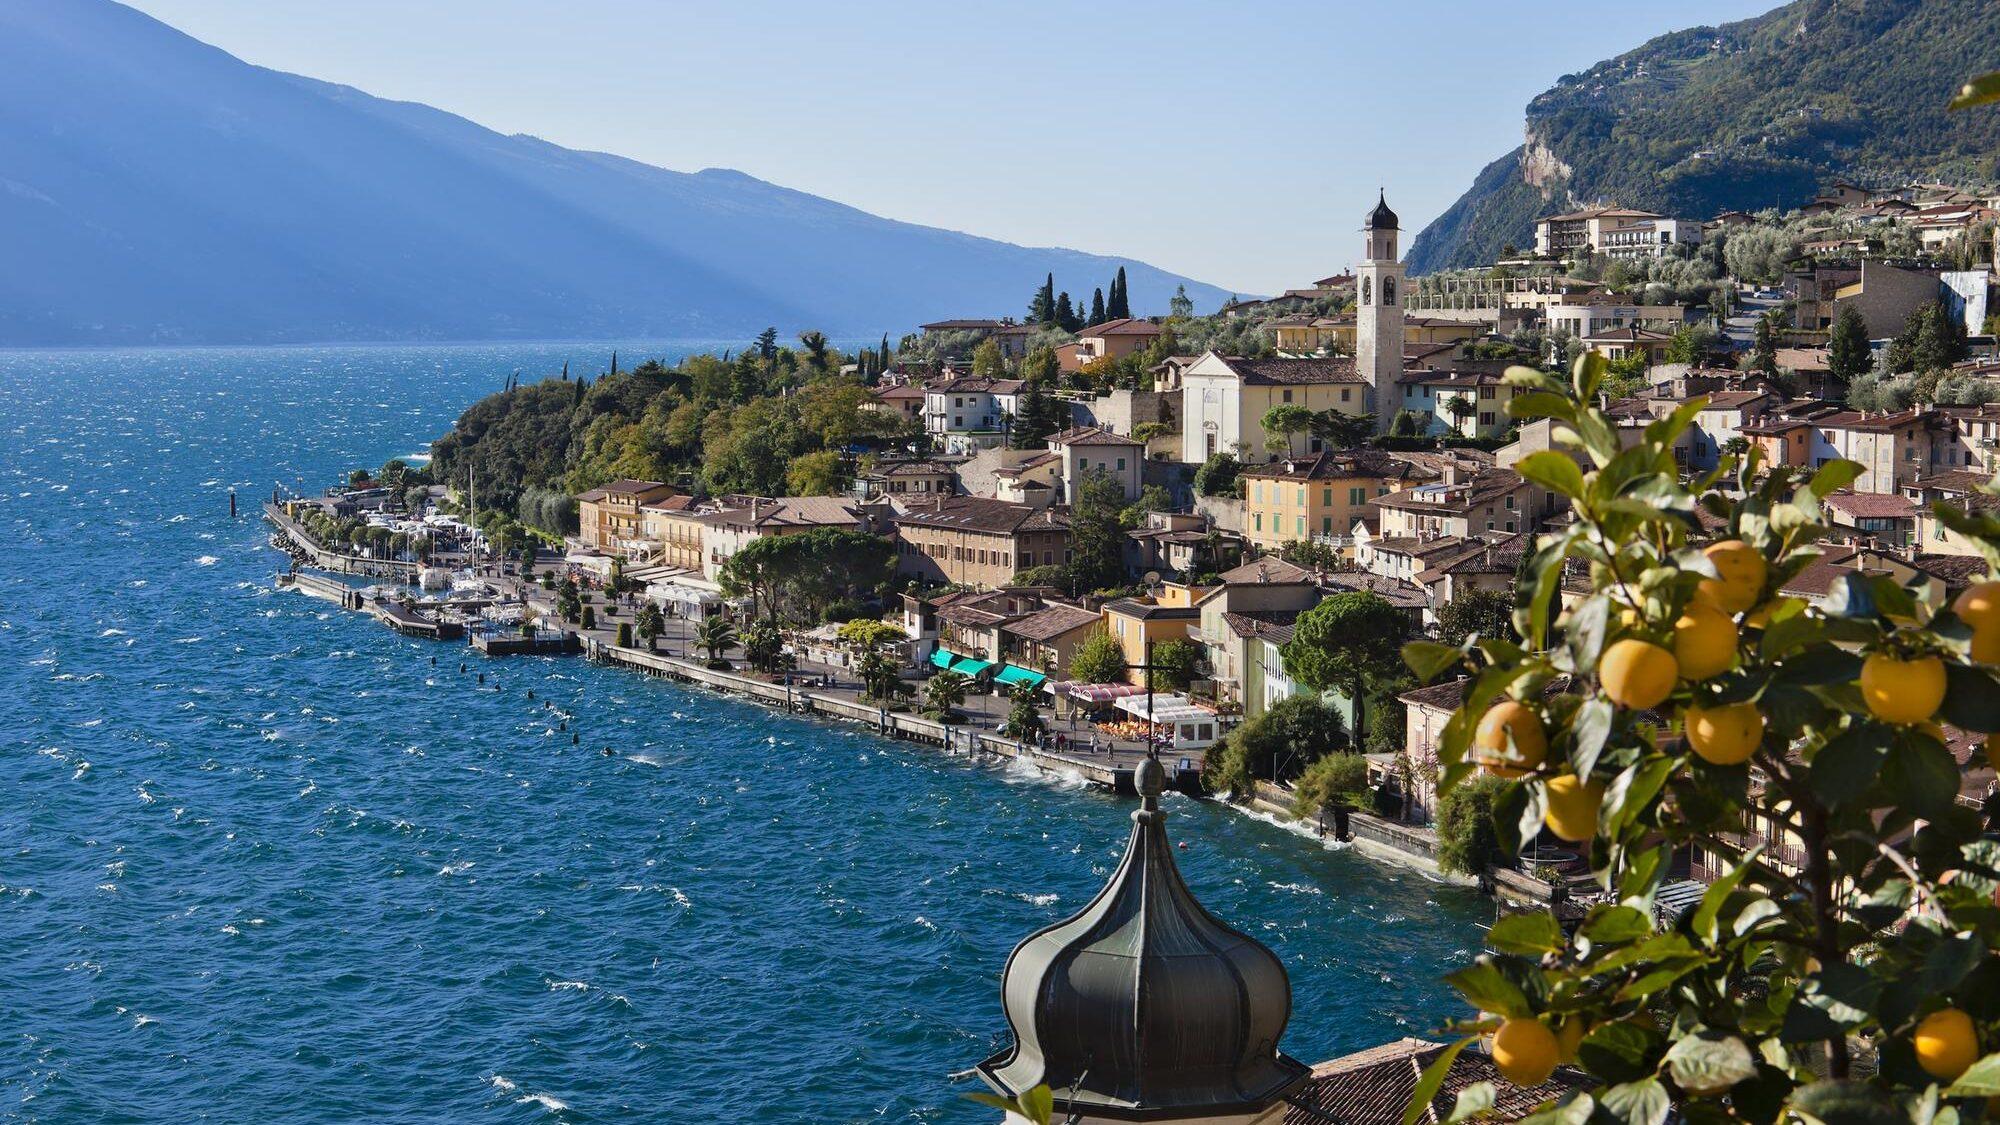 15th International choir and orchestra festival on Lake Garda (Italy)